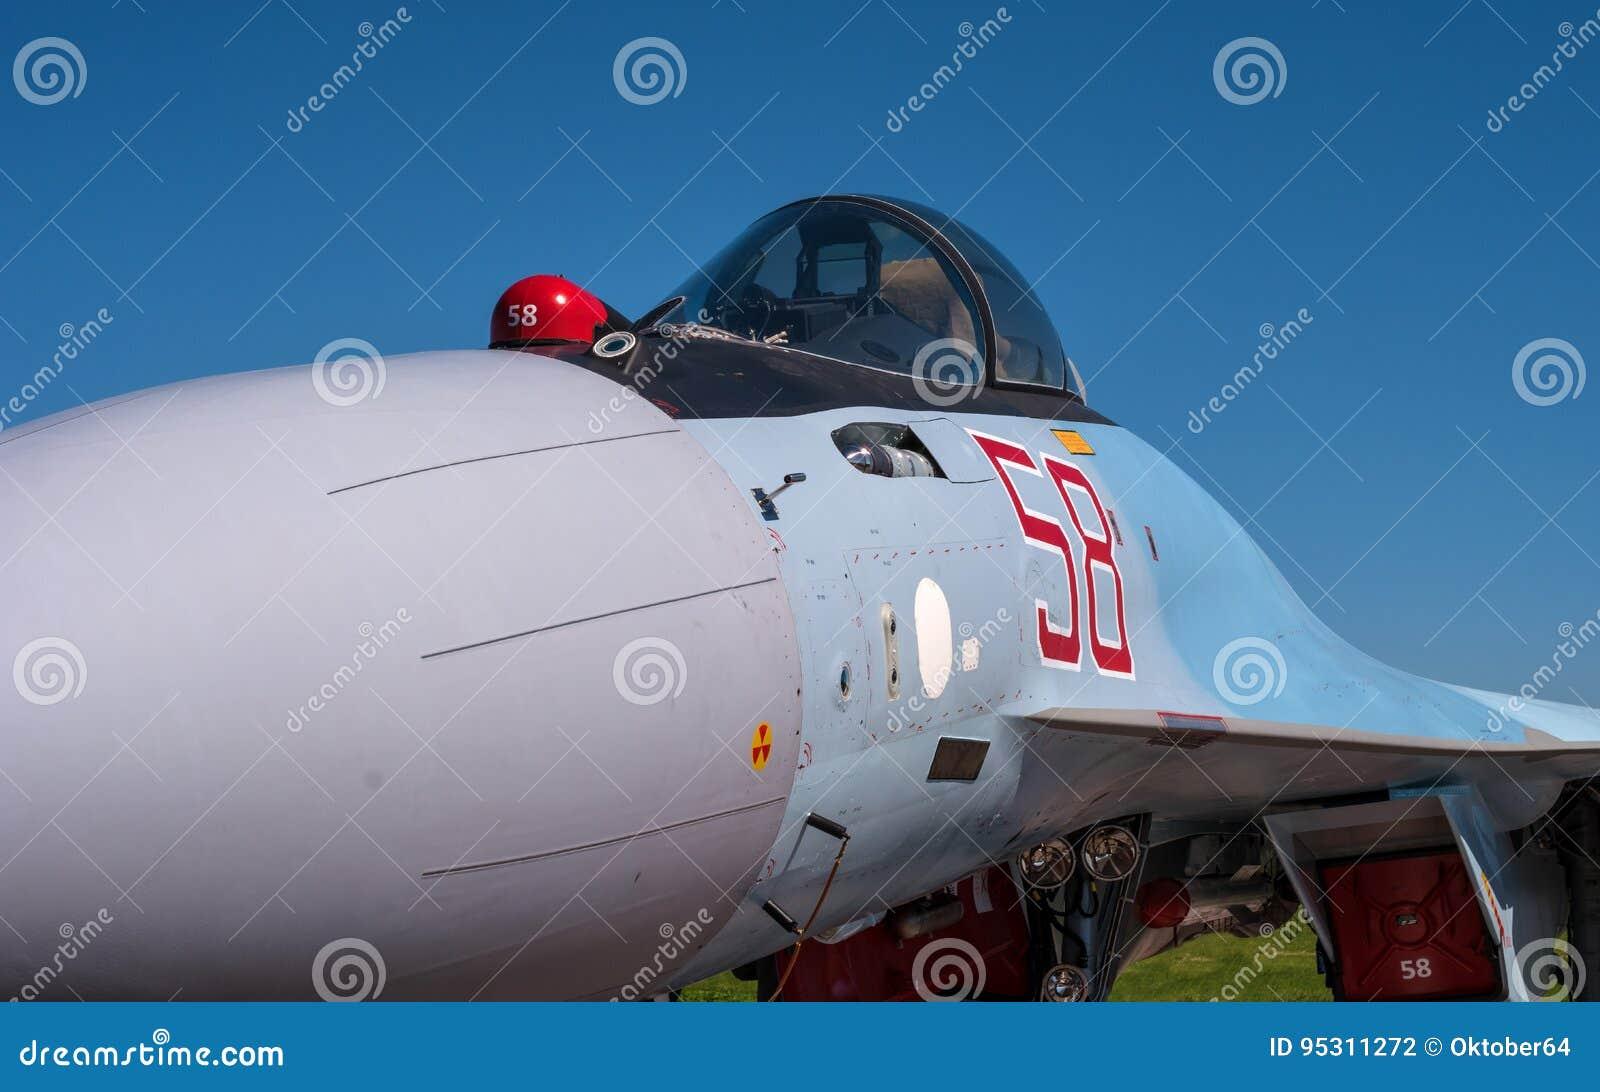 The cabin of a jet fighter pilot of Sukhoi SU35 - under the NATO codification: Flanker-E.